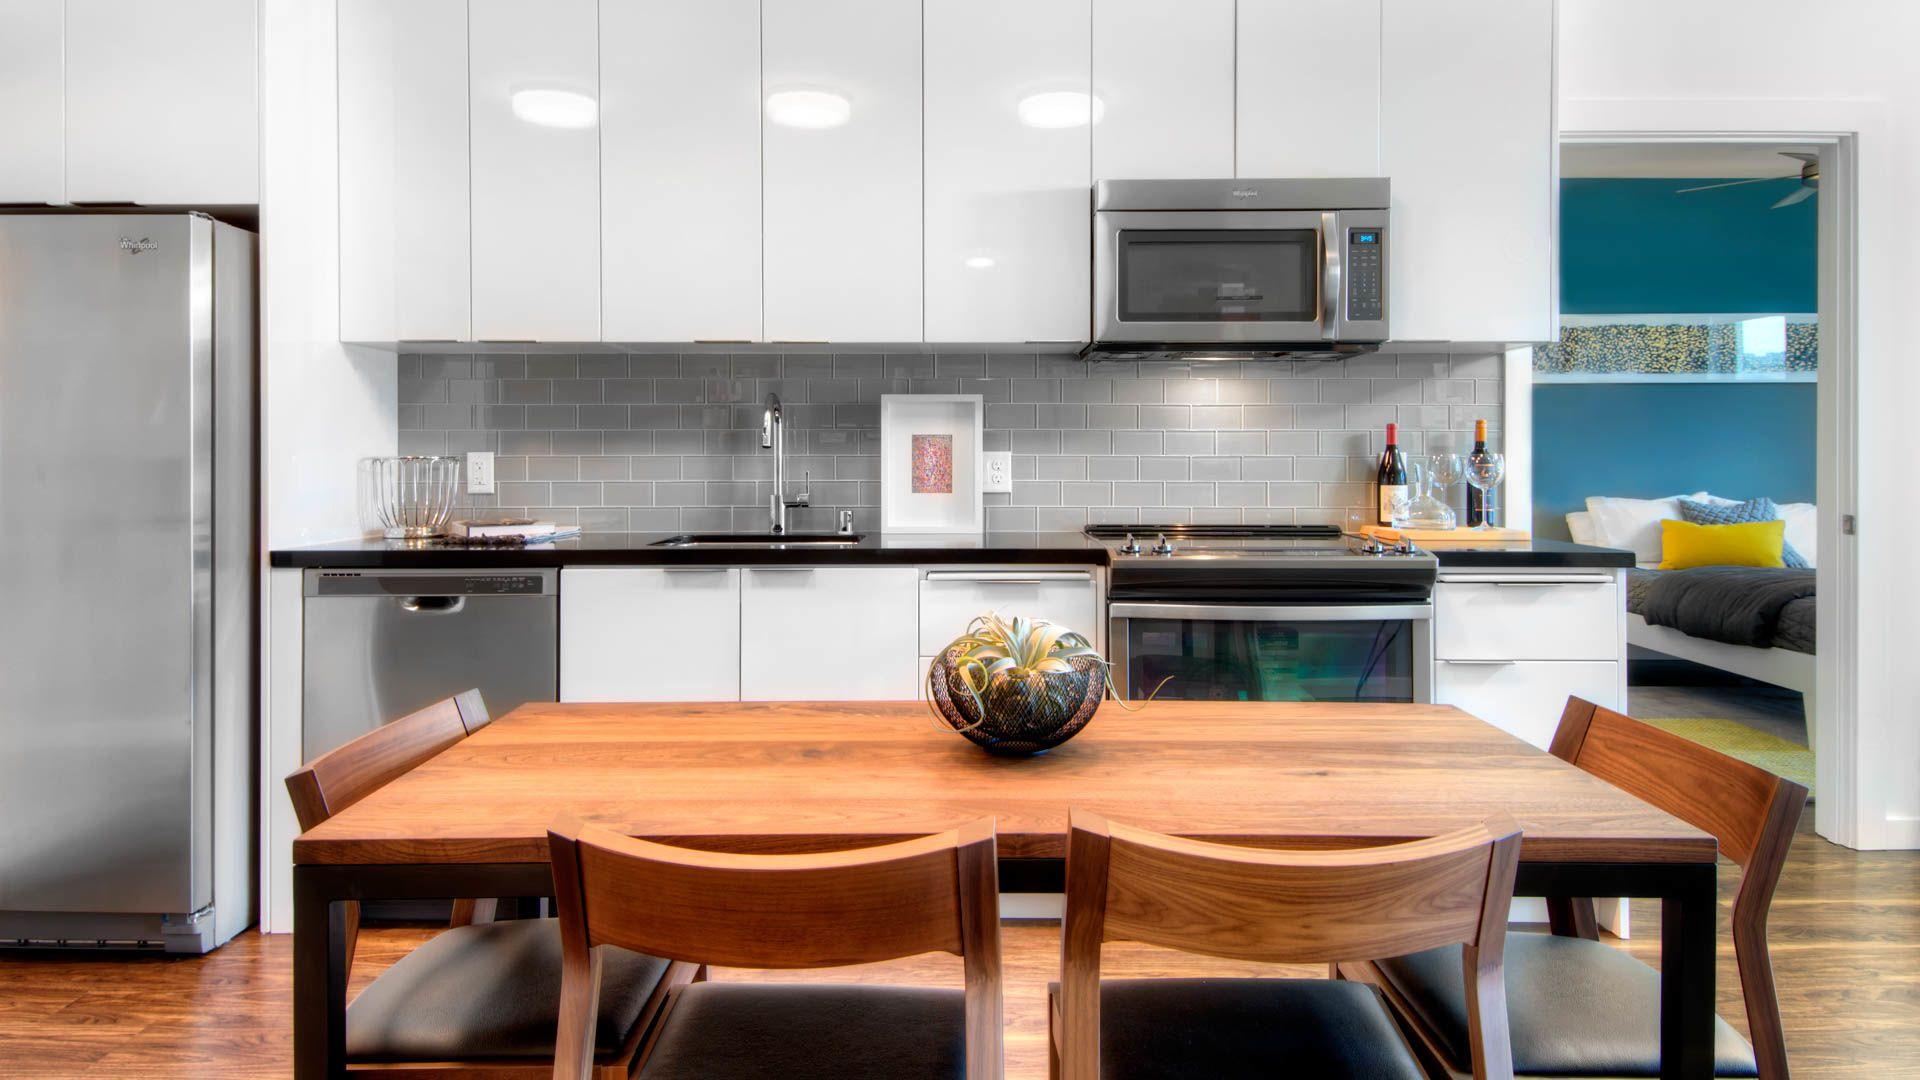 Potrero 1010 Apartments - Dining Room